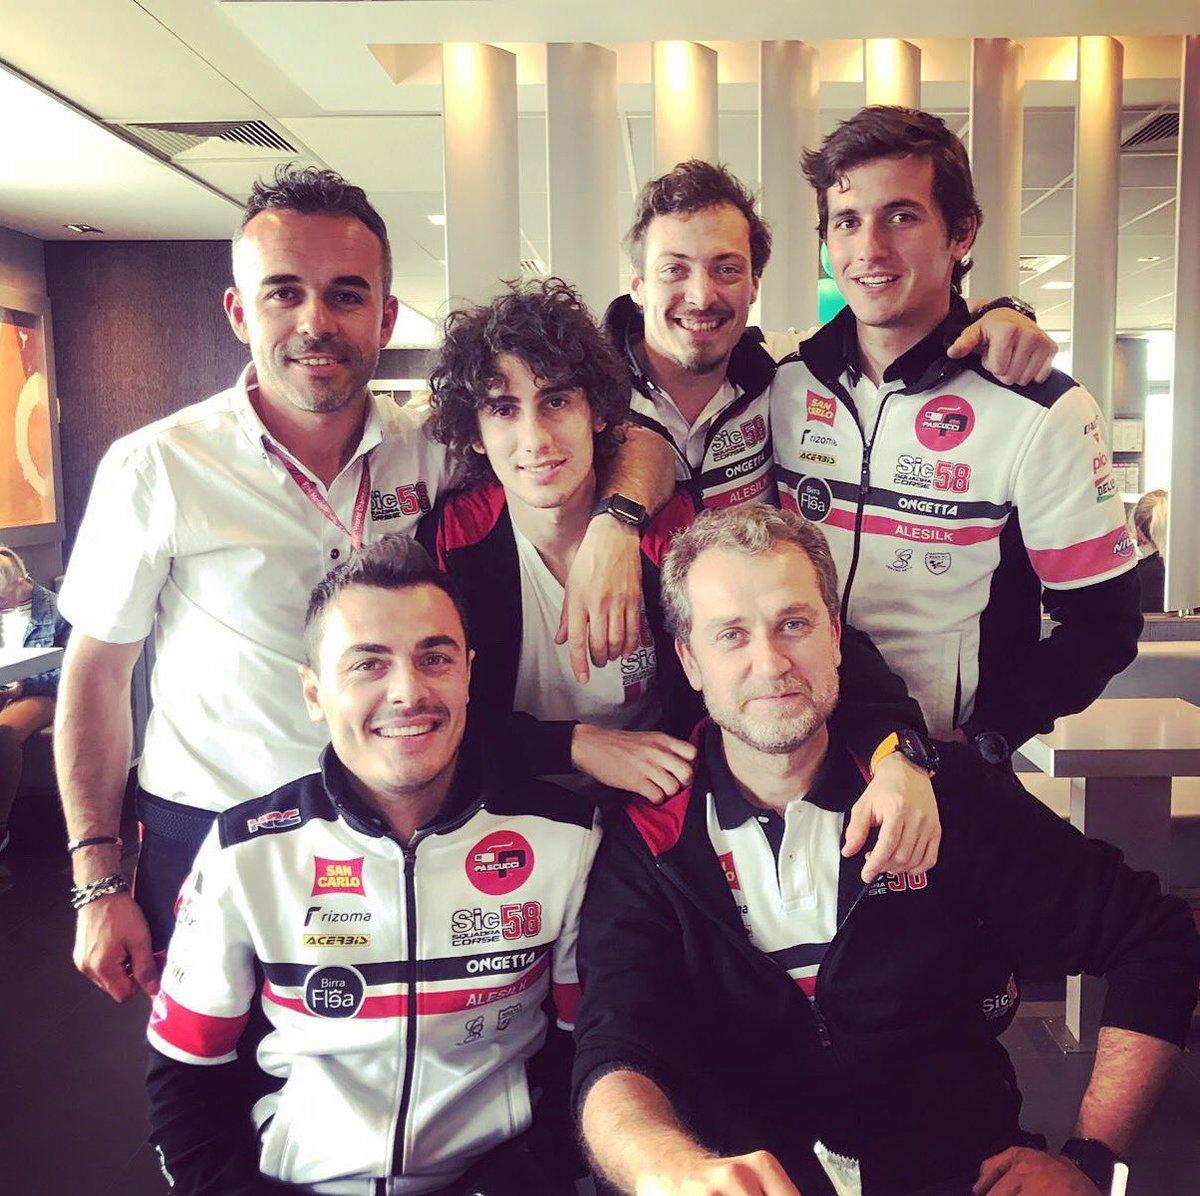 TOGETHER 💪🏻🔥❤️ @_Nicco23 #FrenchGP 🇫🇷 #LeMans #sic58squadracorse #TS24 #NA23 #Moto3 #MotoGP @Acerbisitalia #acerbis #acerbismotorsport #acerbisplastics #acerbisathlete #Sic58